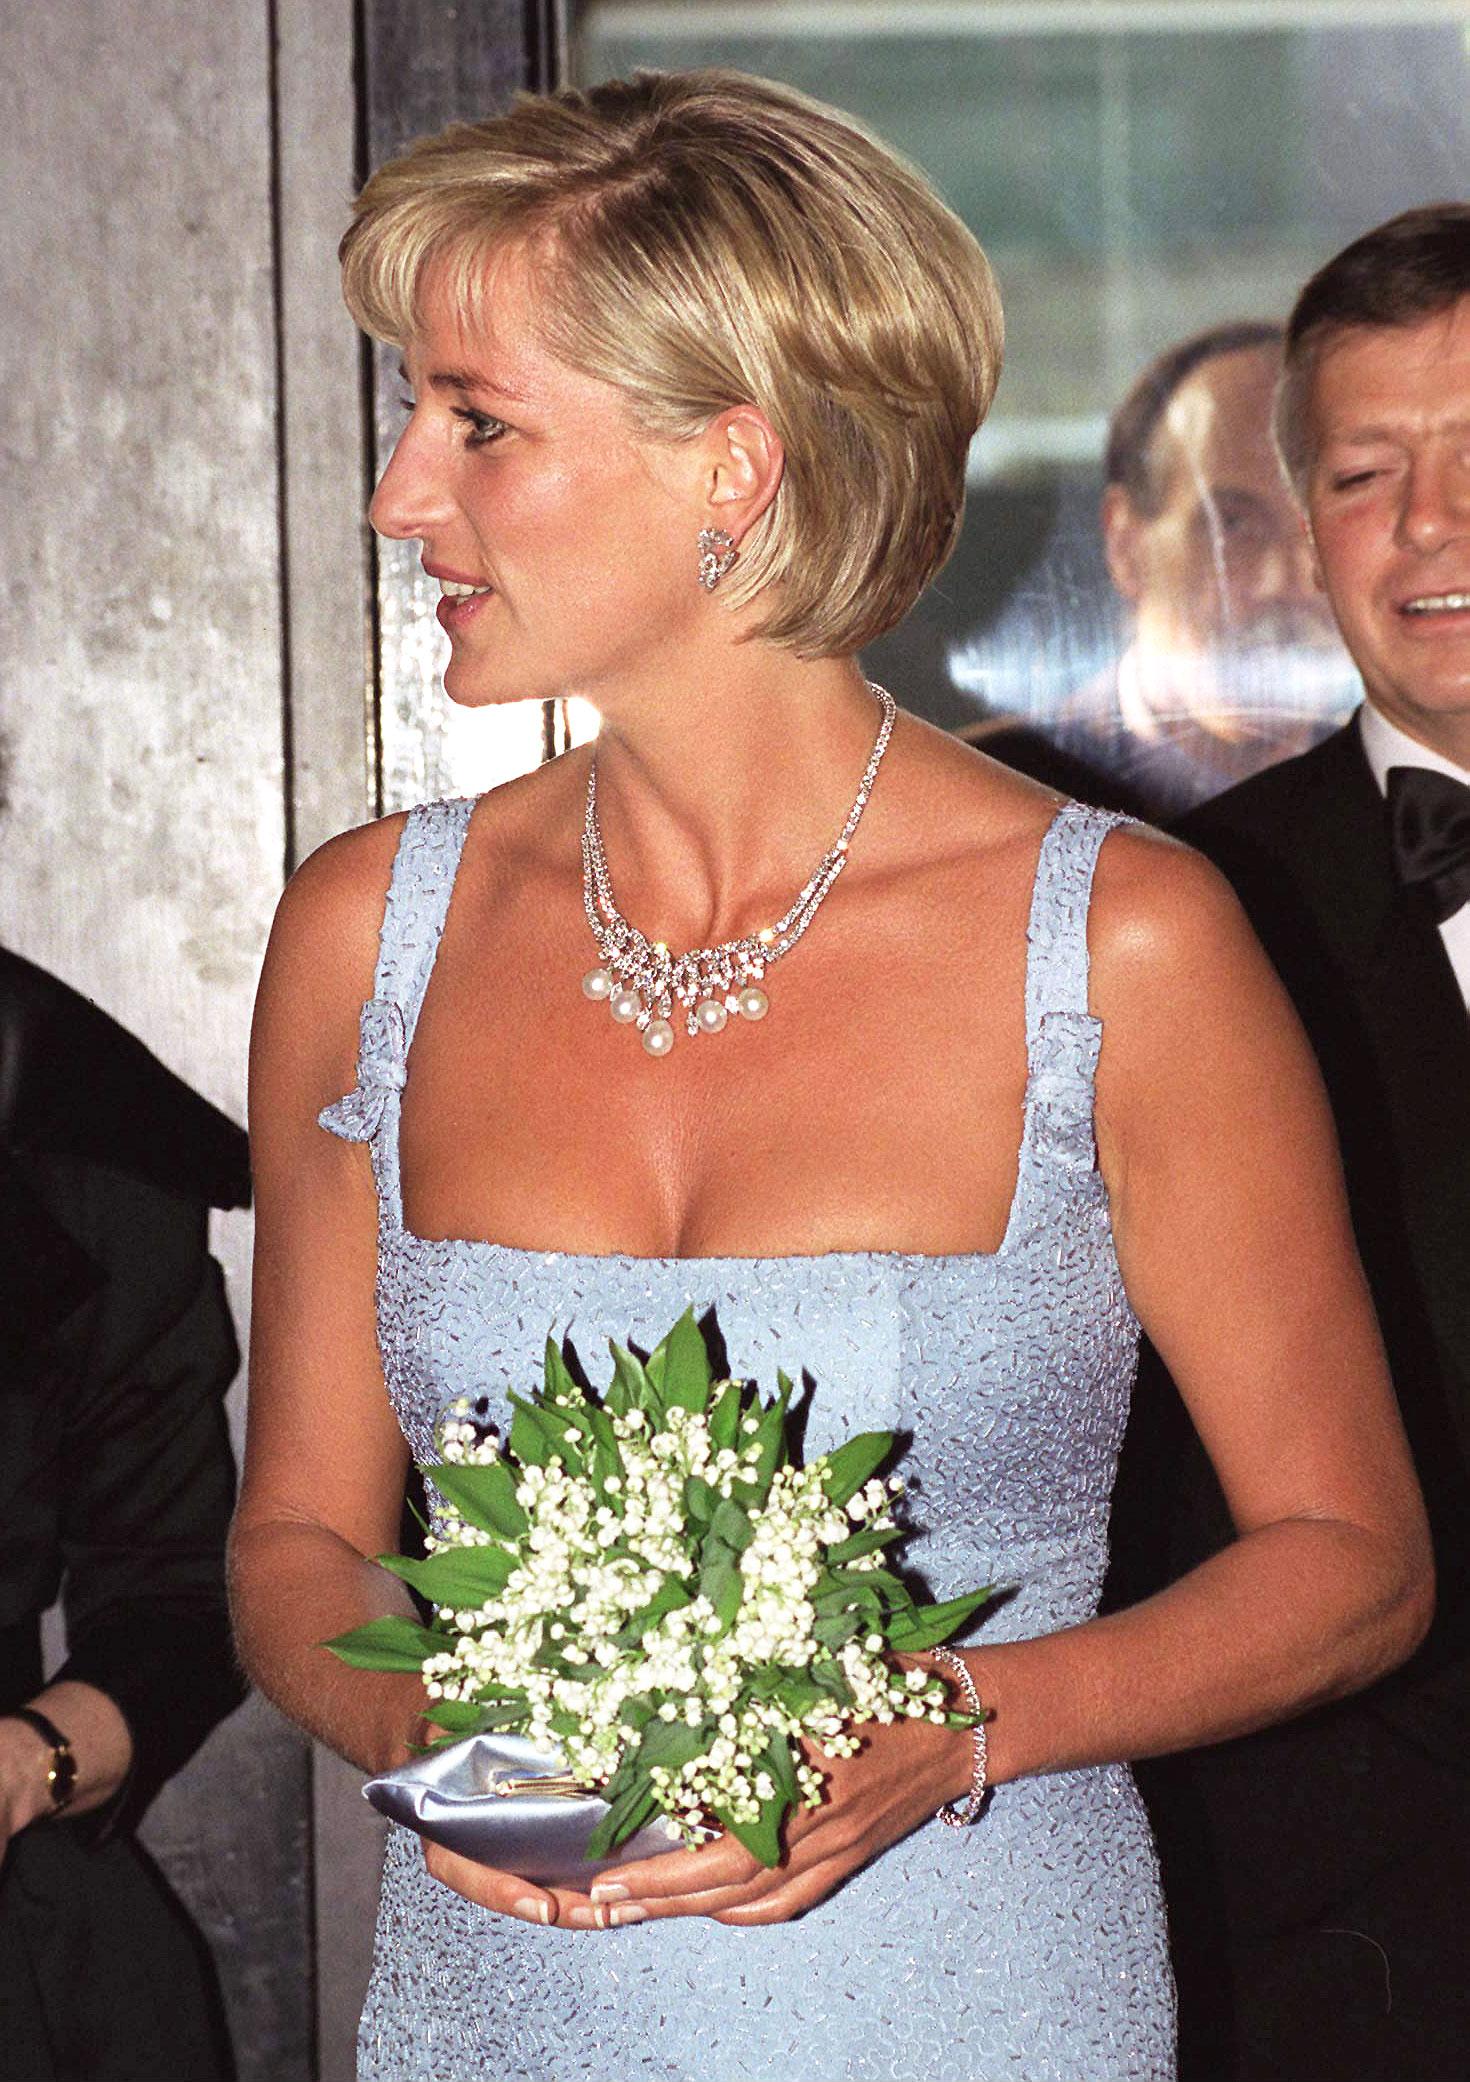 Princess Diana's iconic diamond and pearl necklace is up for auction Princess Diana's iconic diamond and pearl necklace is up for auction new foto